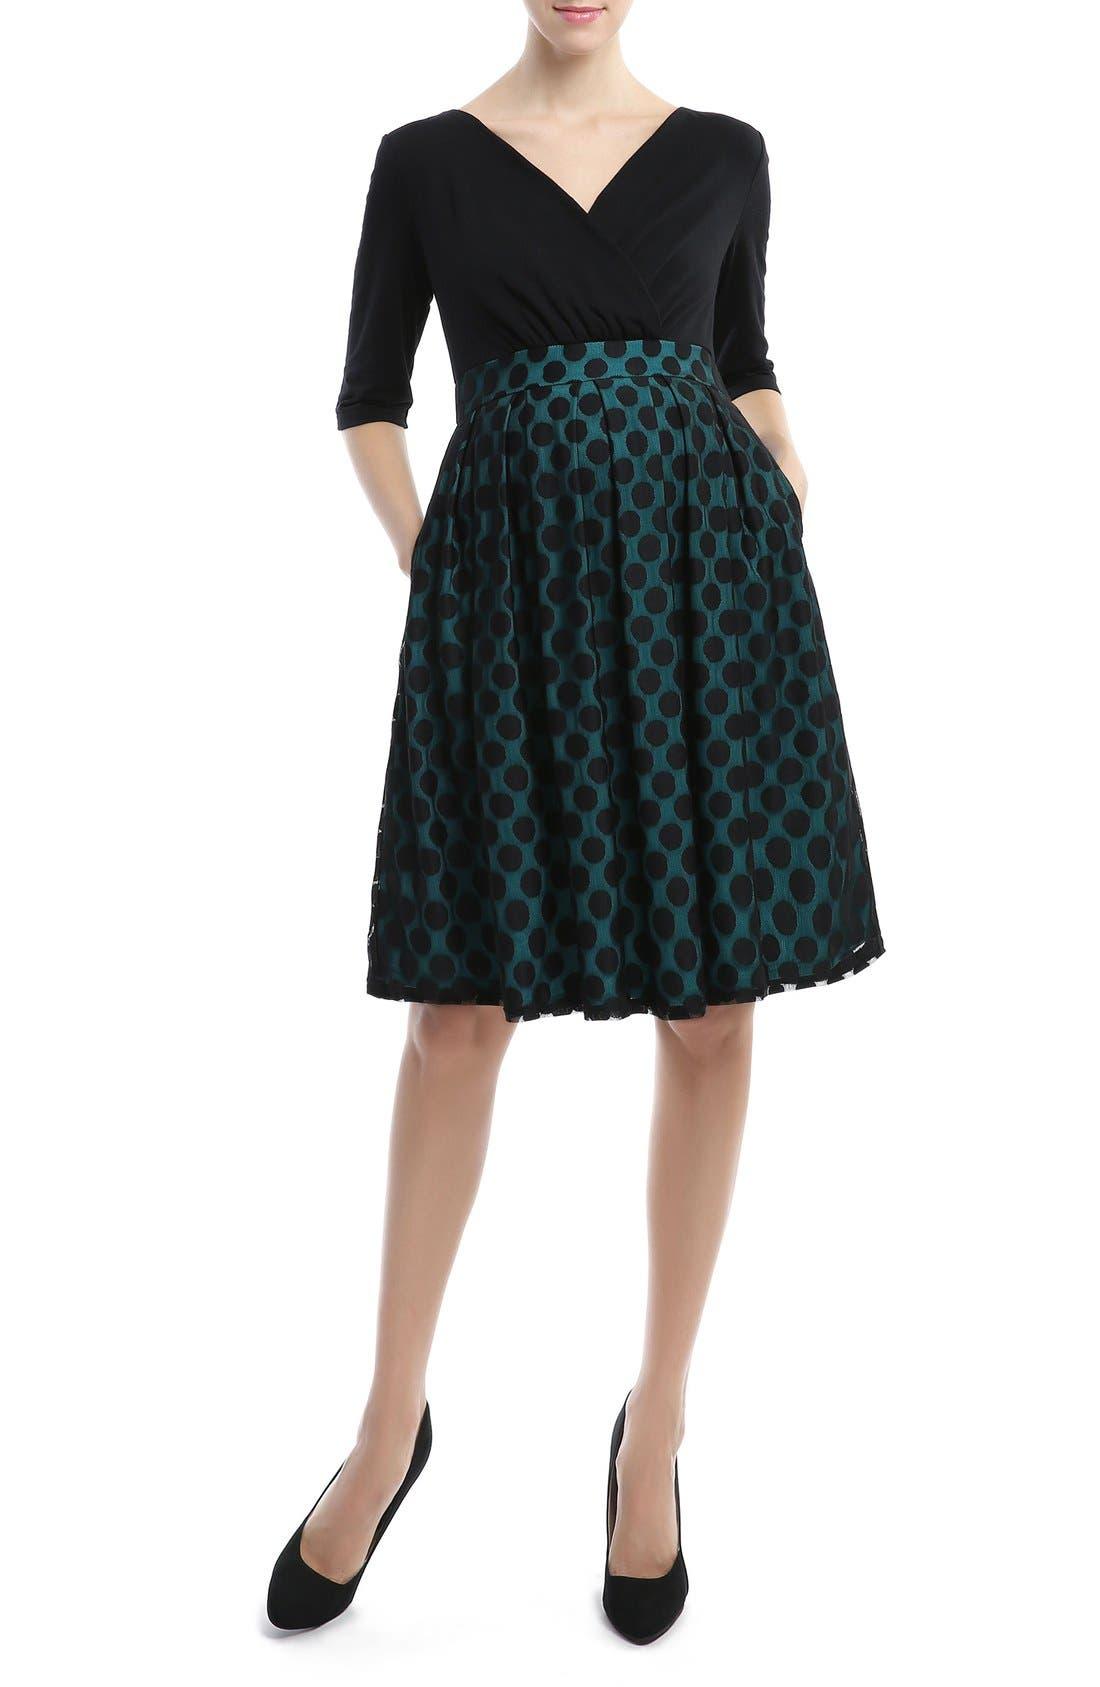 Alternate Image 1 Selected - Kimi and Kai 'Liliana' Polka Dot Lace Maternity Dress